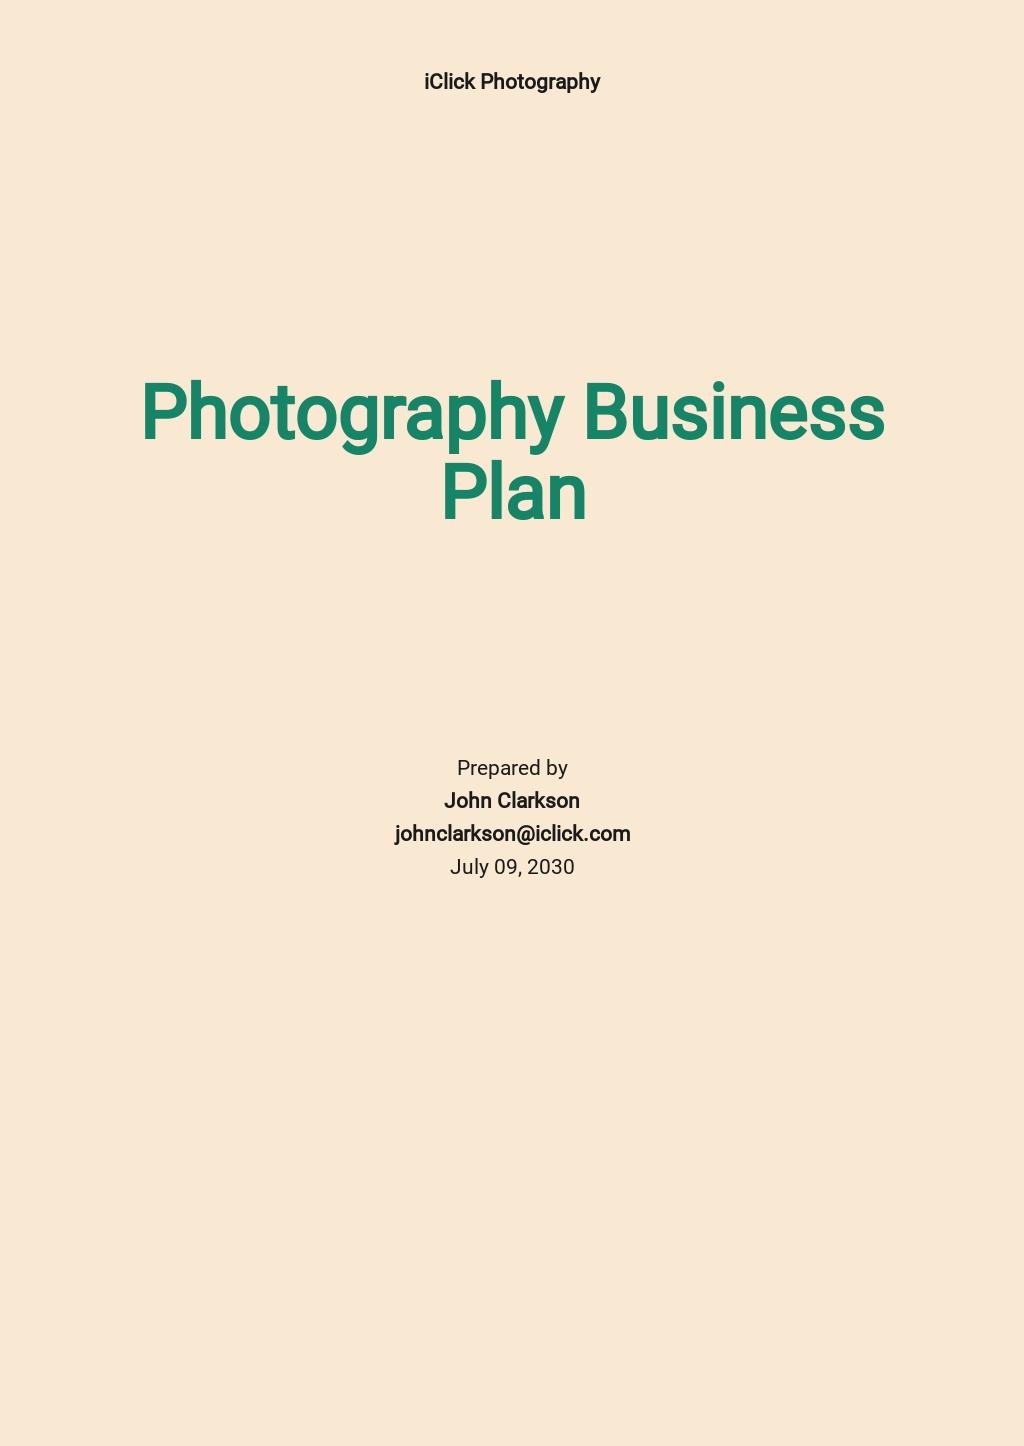 Photography Business Plan Template.jpe